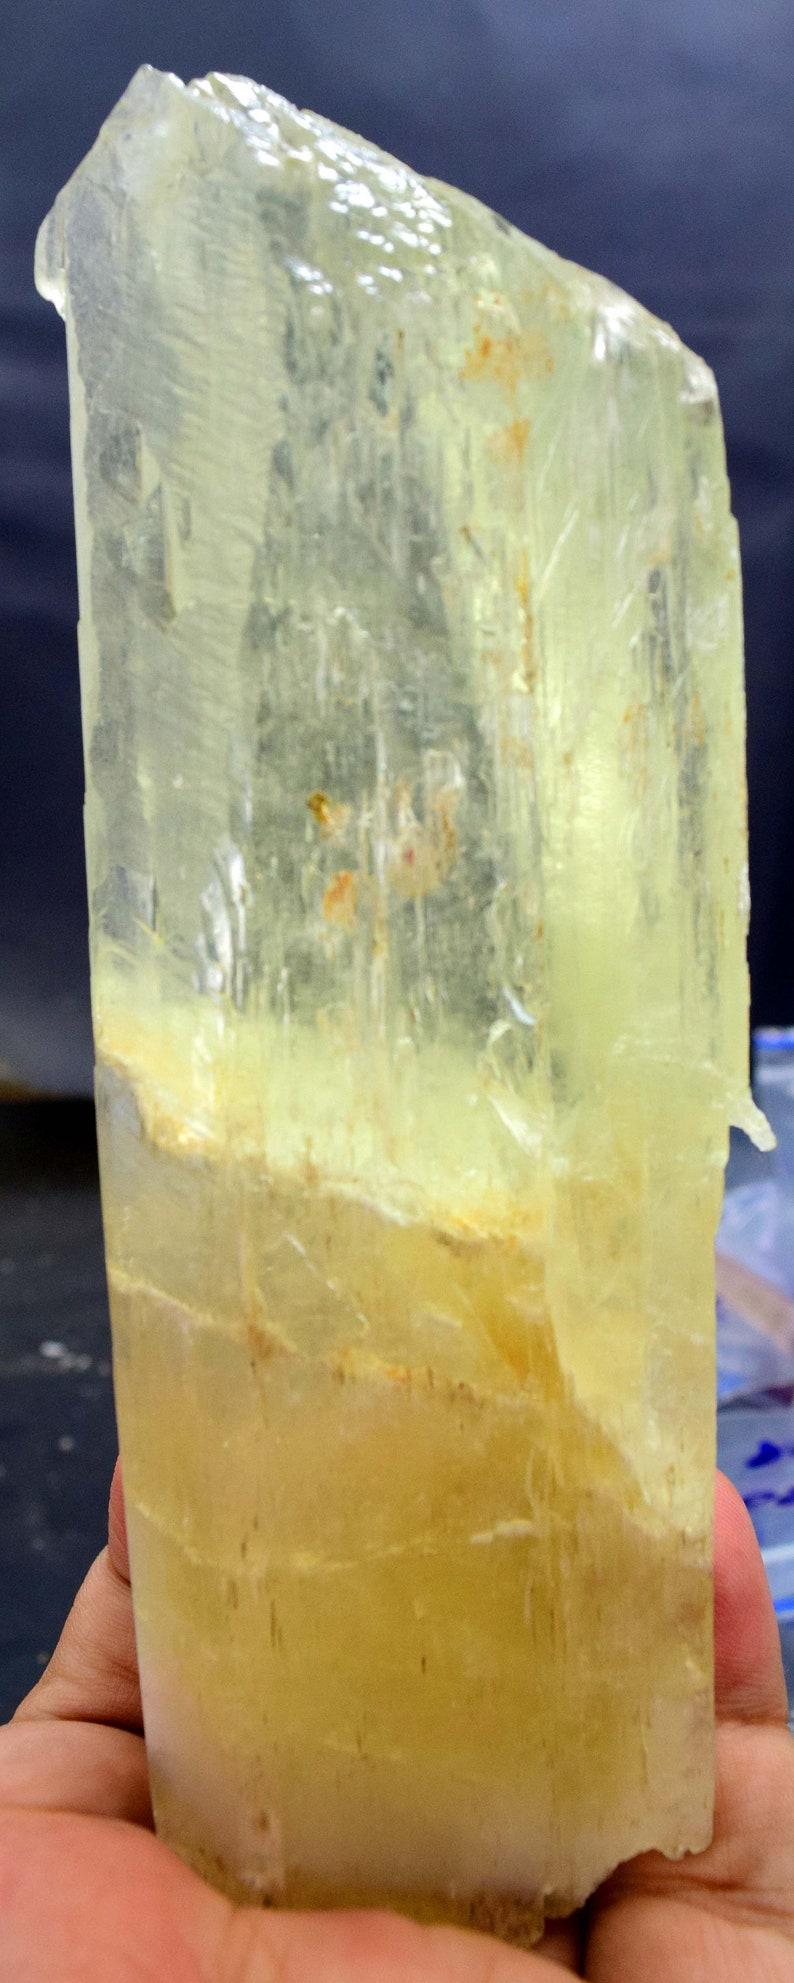 Yellow Kunzite Triphane Crystal  396 Gram  1495229 mm image 0